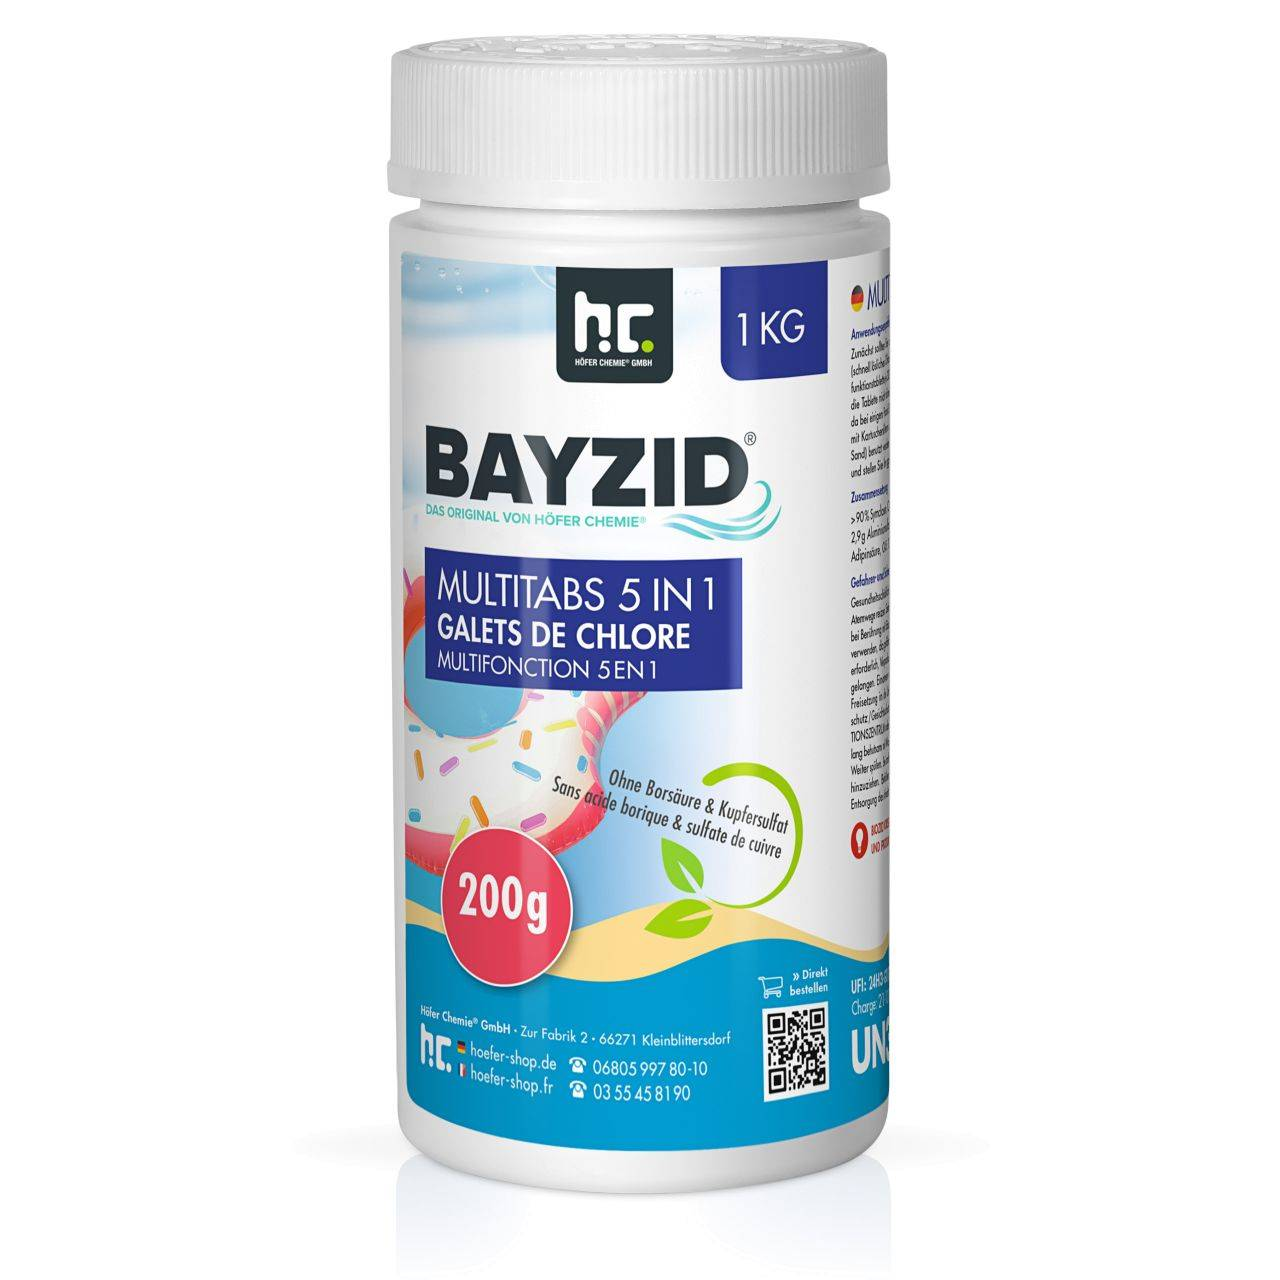 BAYZID 12 kg Galets de chlore multifonction (200g) (12 x 1 kg)